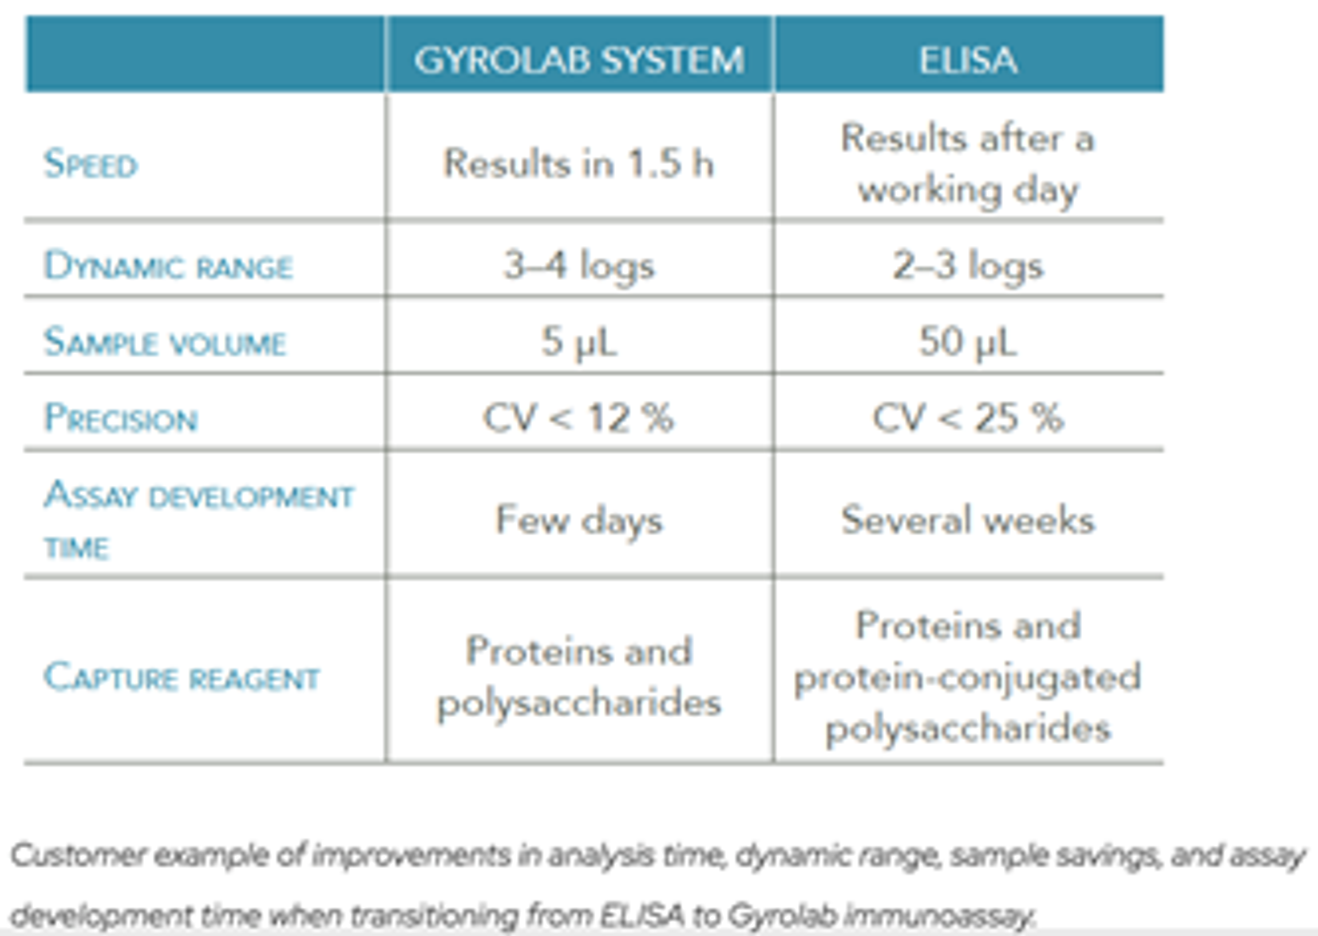 Comparison of Gyrolab immunoassay performance to ELISA